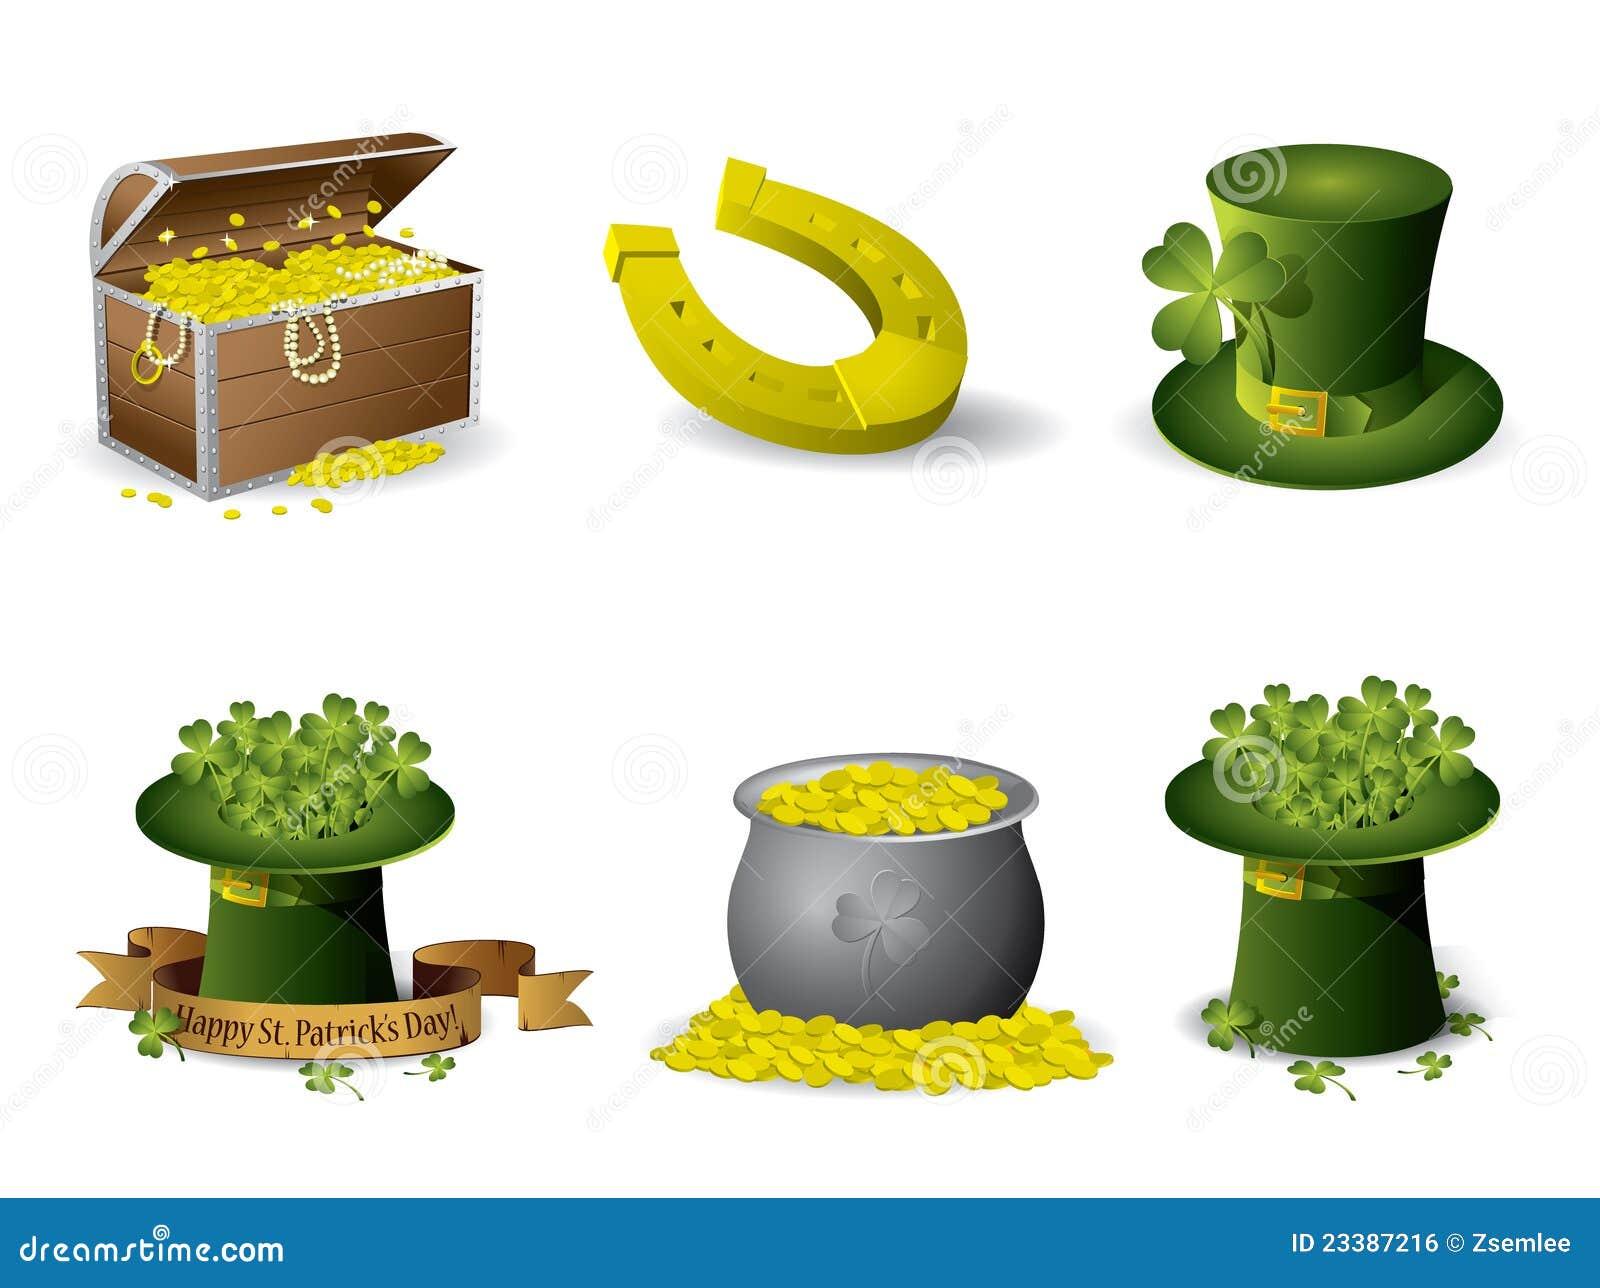 Saint patricks day symbols stock vector illustration of foliage saint patrick s day symbols biocorpaavc